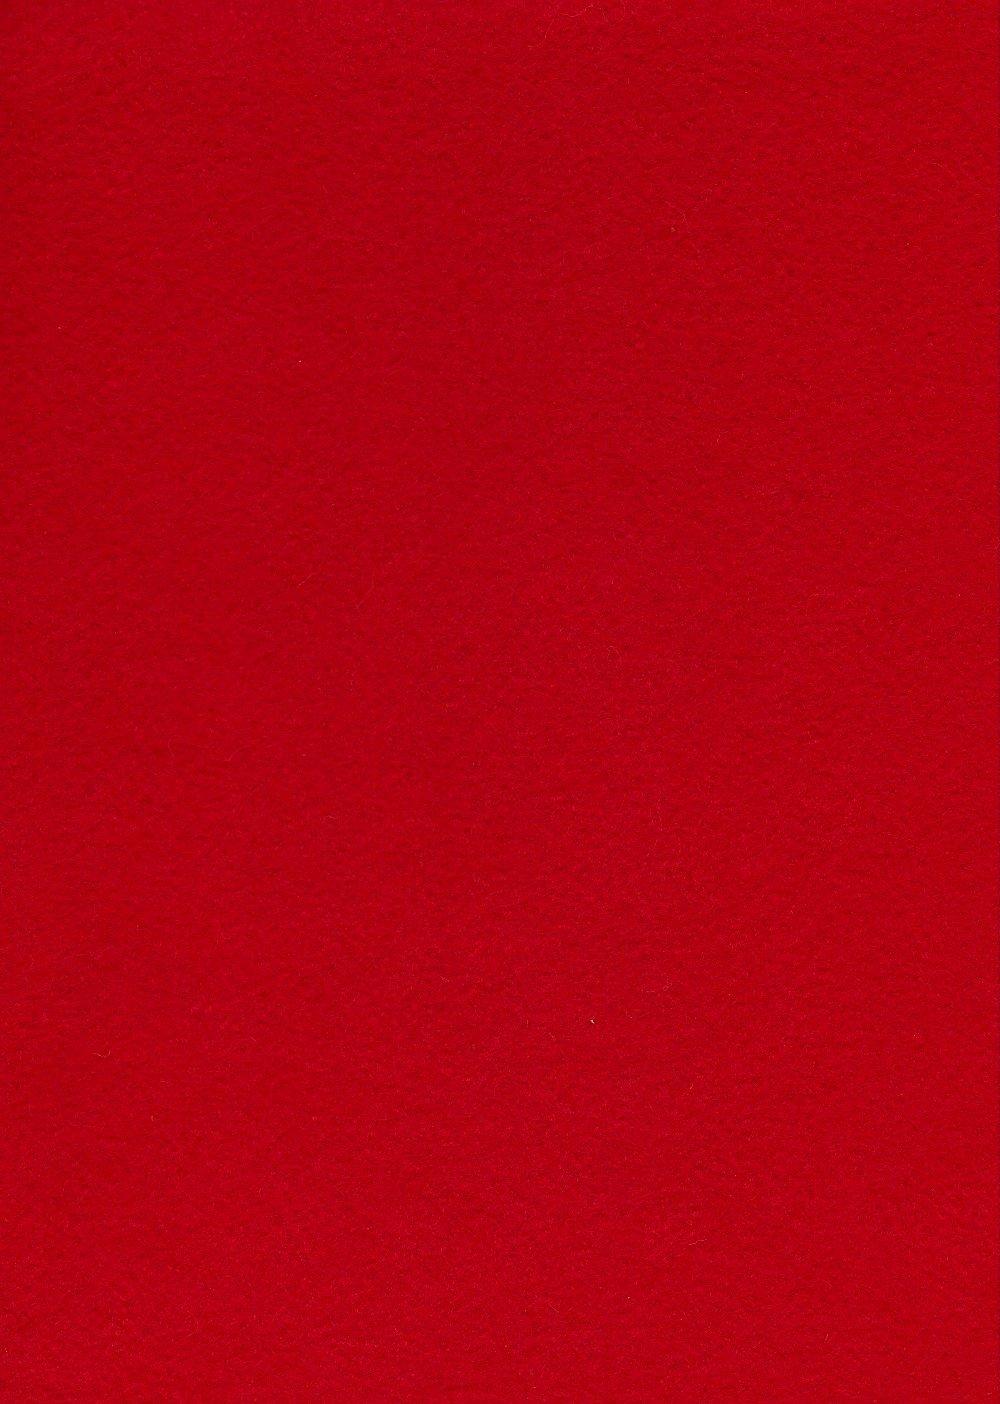 Bright Red - 12 x 18 Square